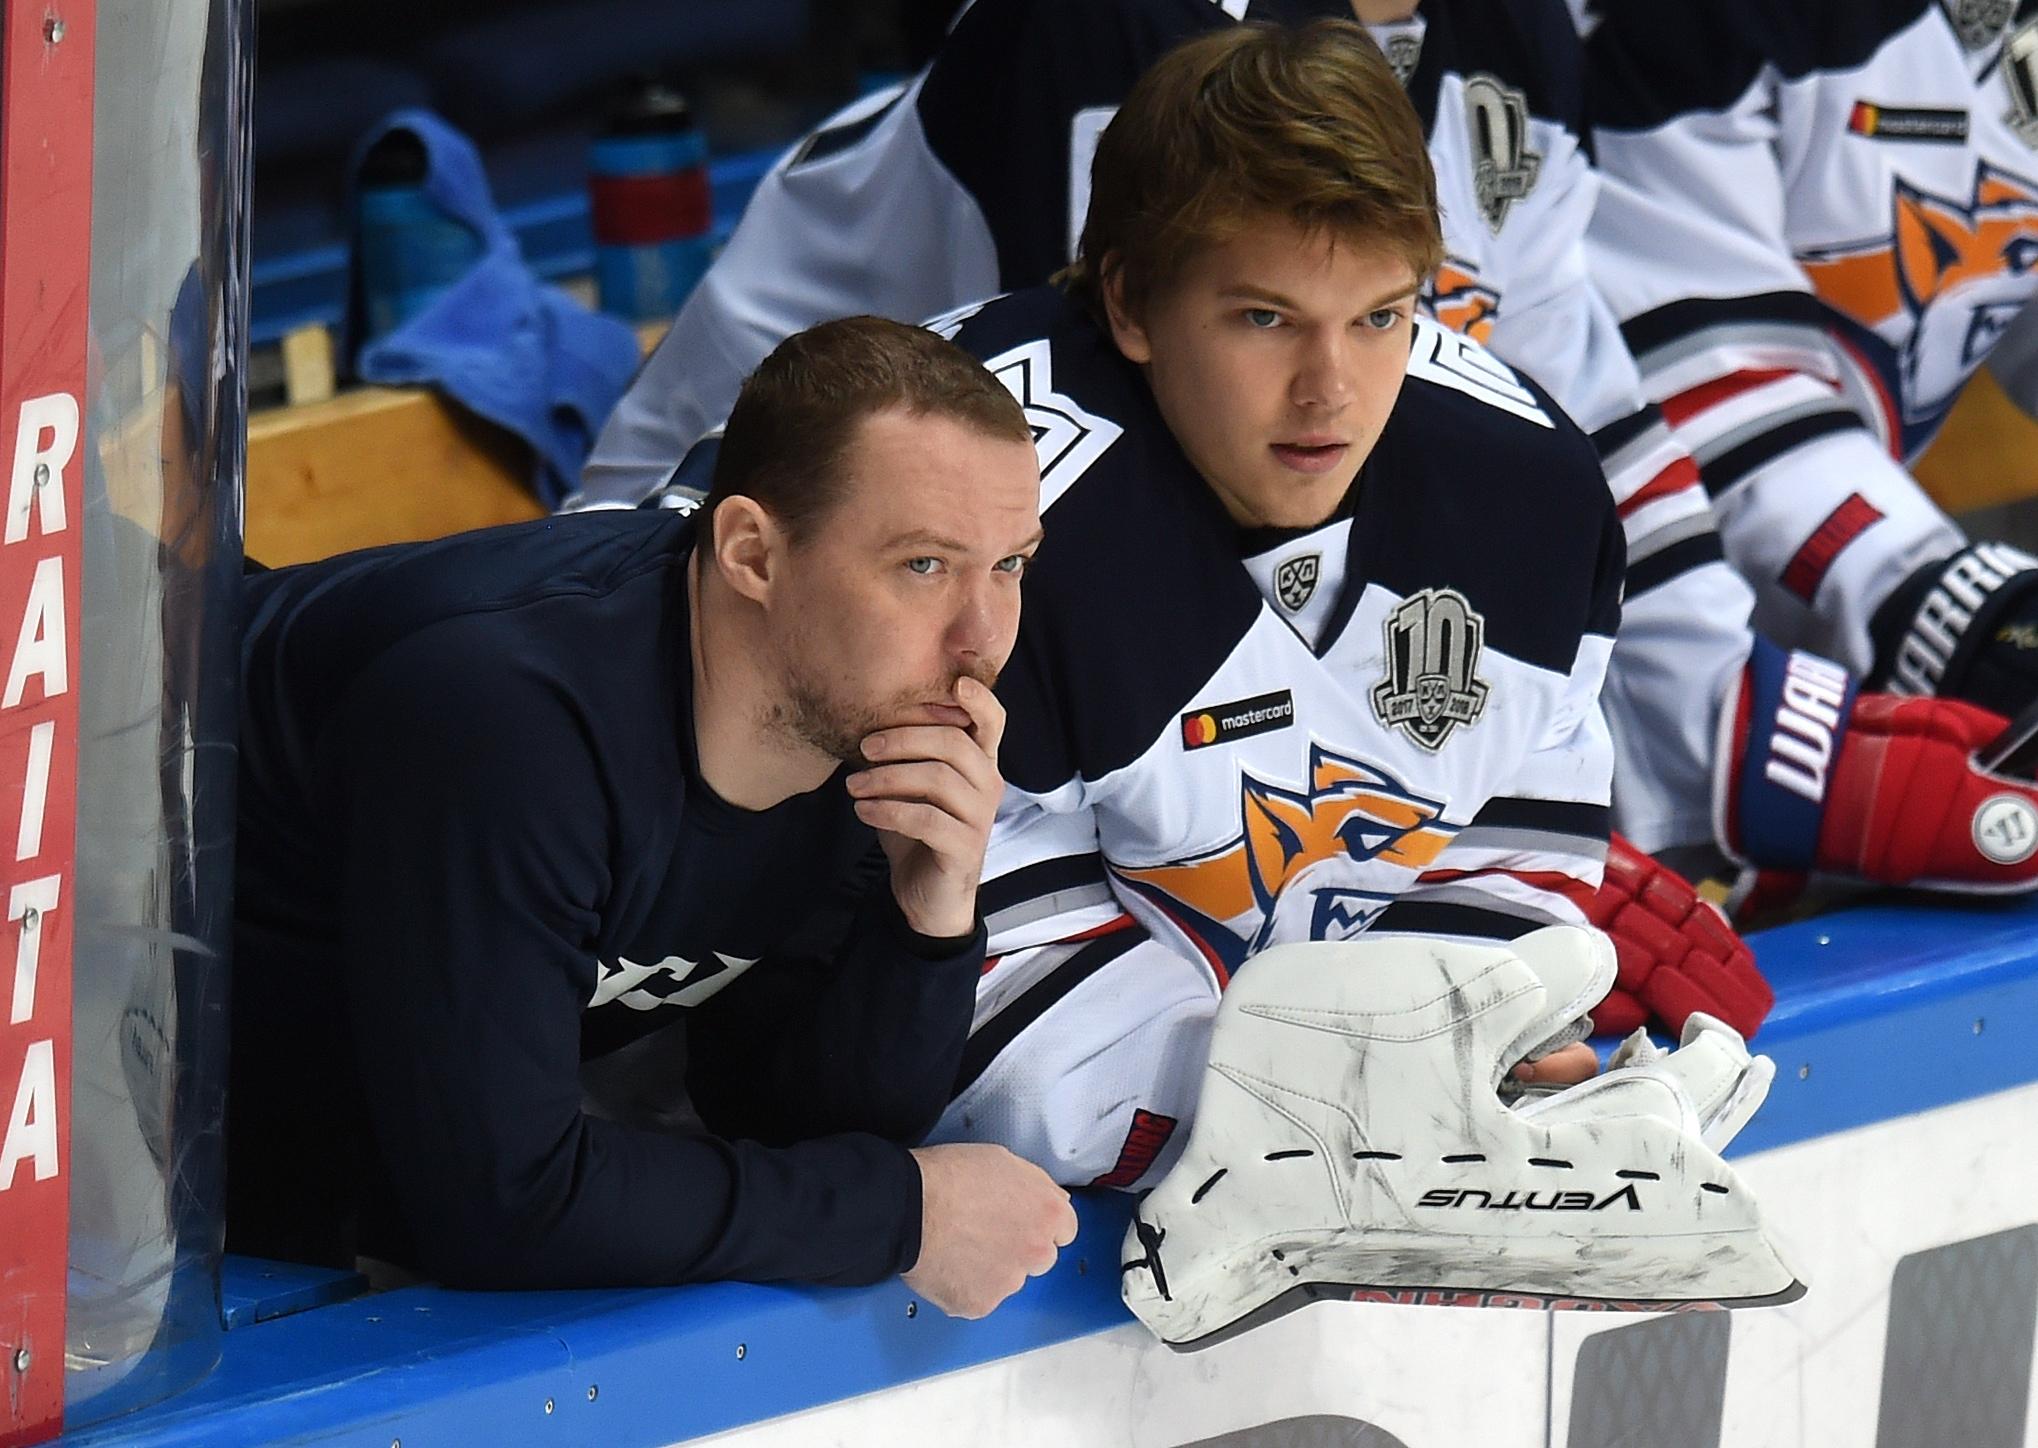 Сергей Мозякин и Василий Кошечкин. Фото: Юрий Кузьмин